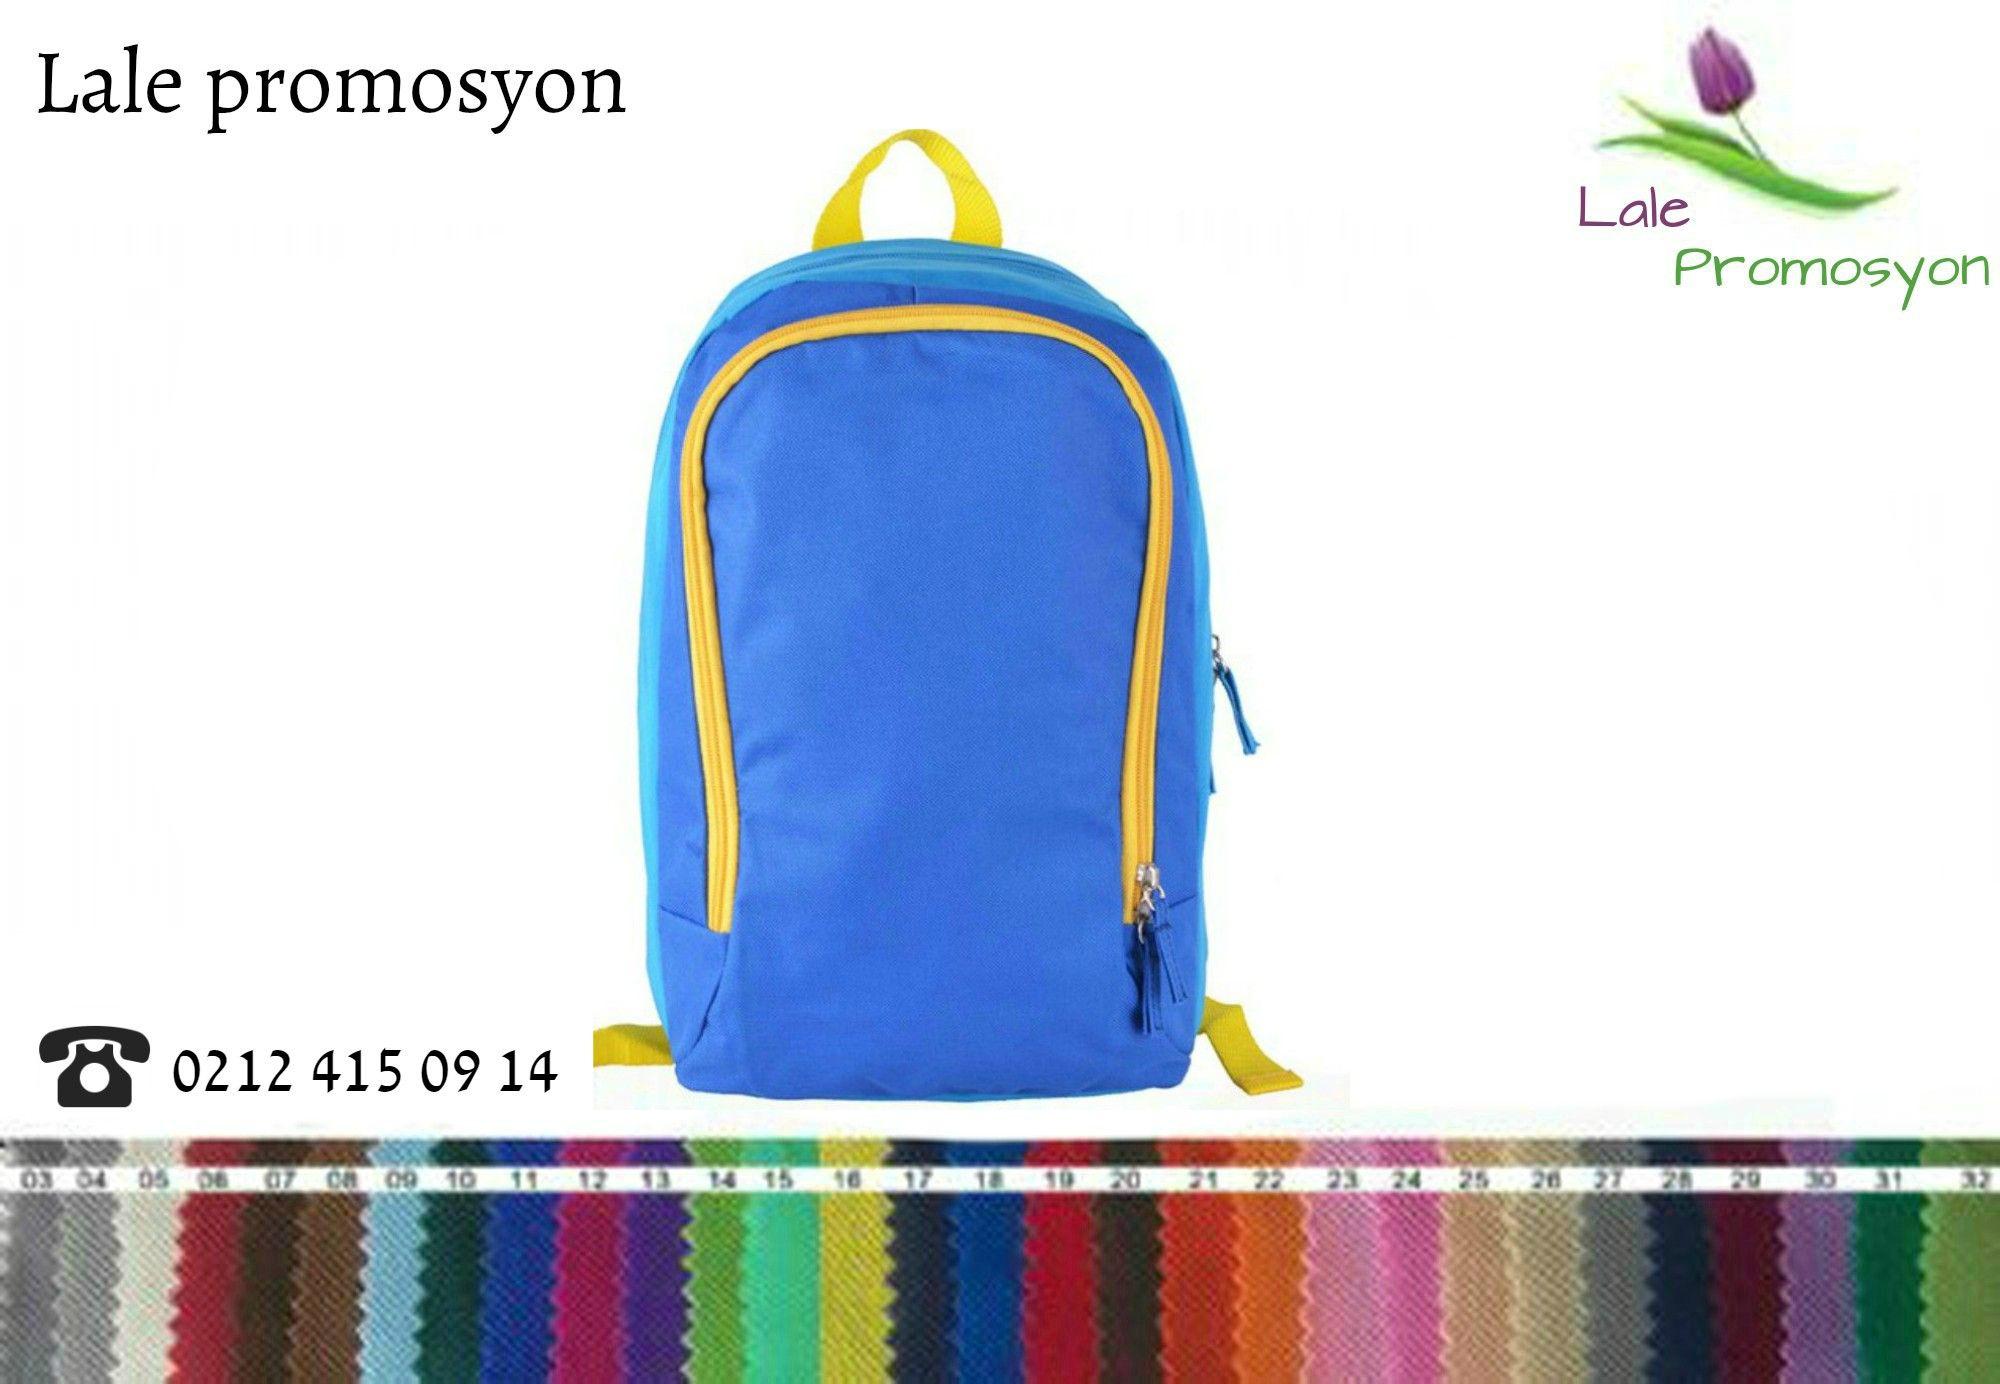 6a5672cd575c9 حقيبة ظهر مدرسية للحضانة ورياض الأطفال